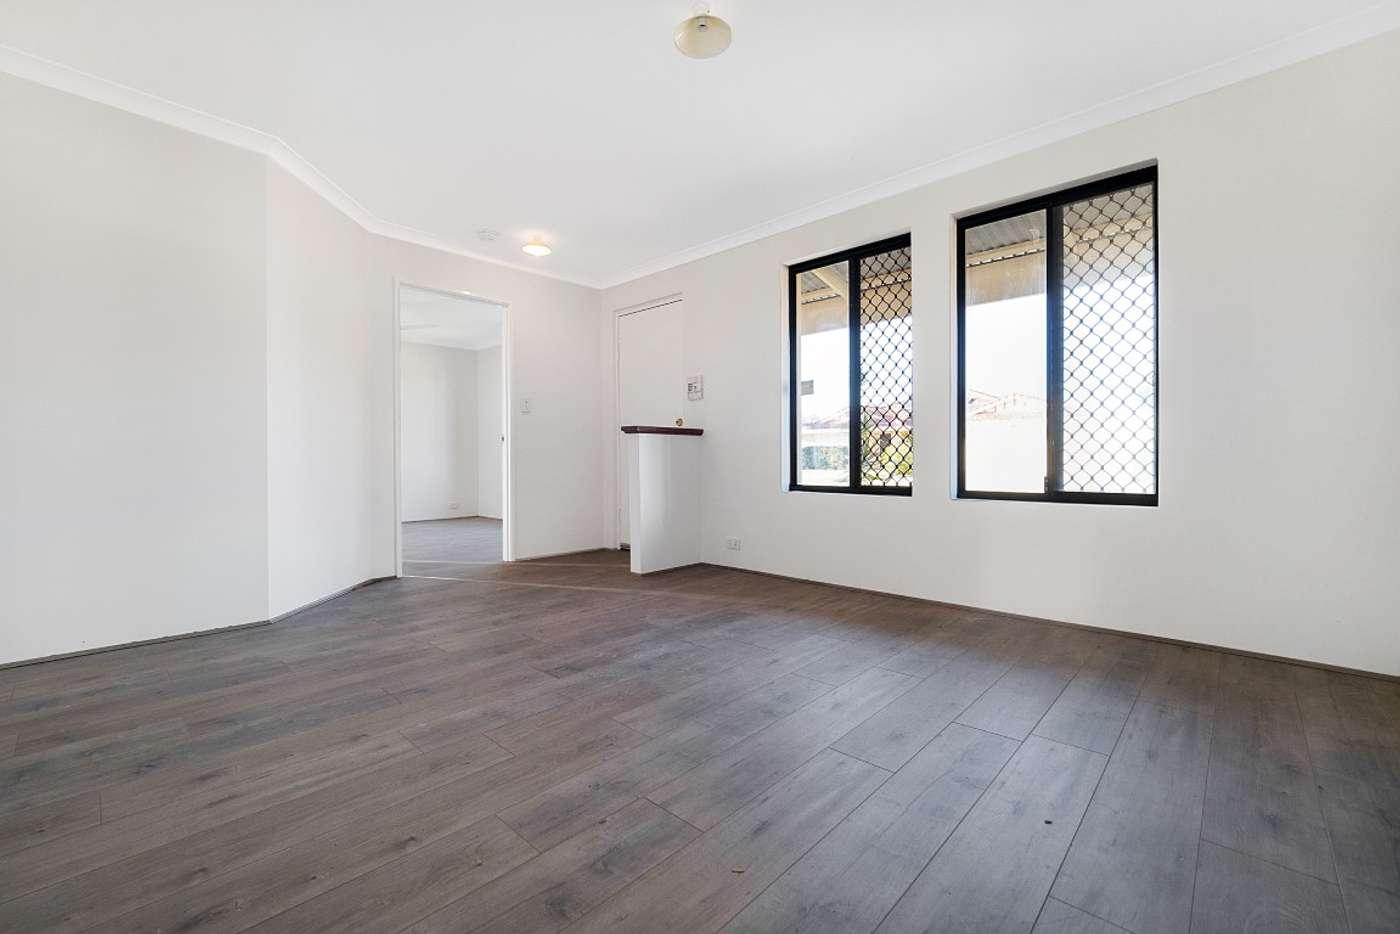 Sixth view of Homely house listing, 8 Woodview Retreat, Caversham WA 6055